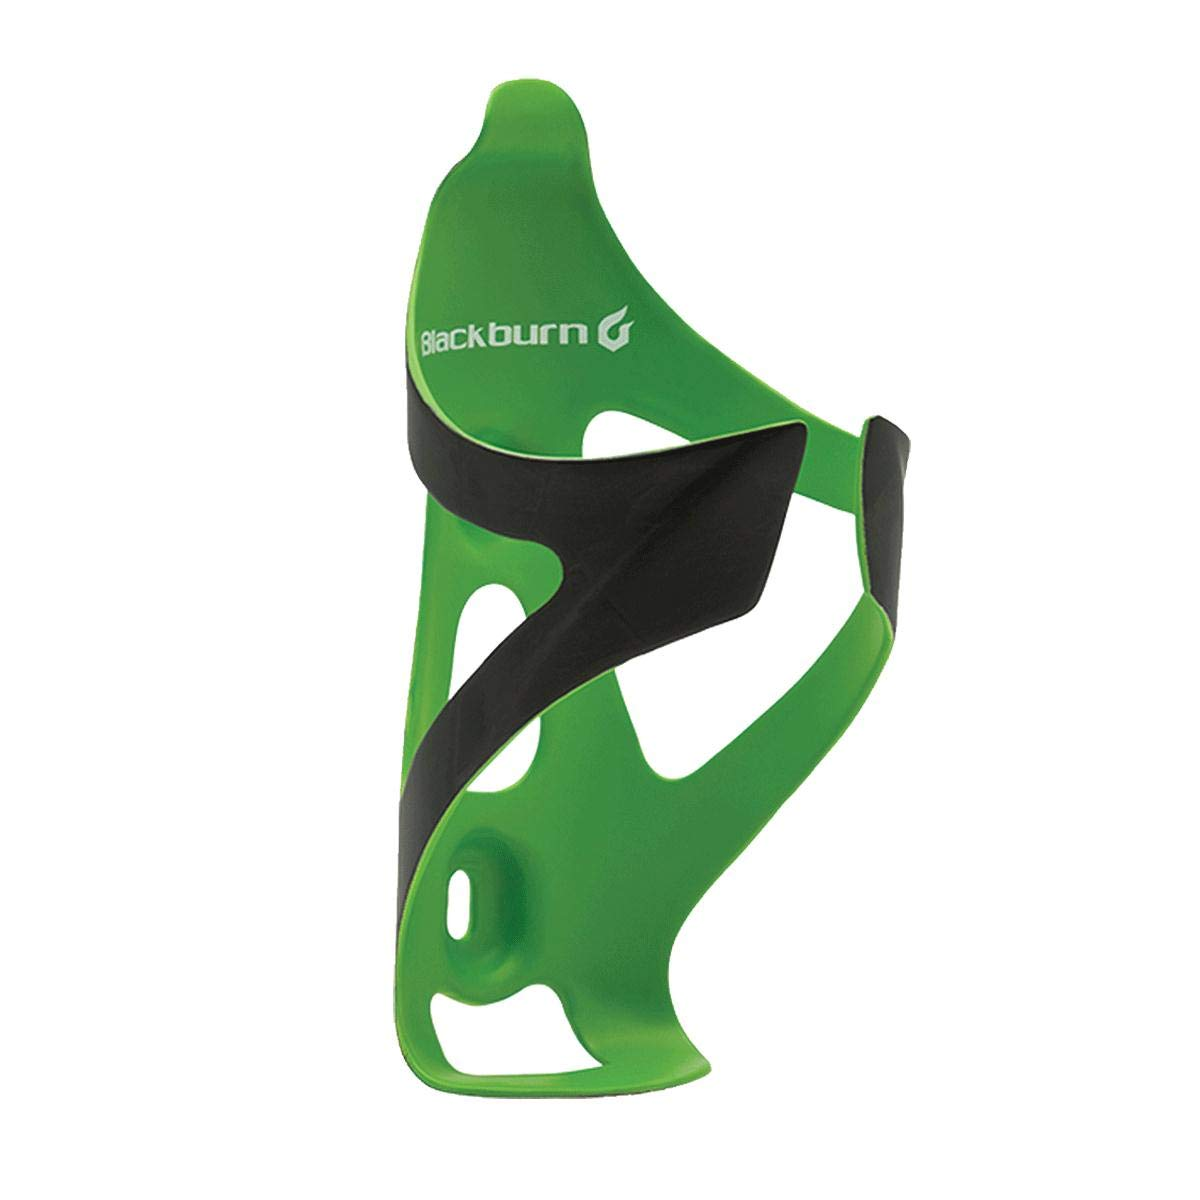 Blackburn Camber UD Carbon Cage Matte Black/Green, One Size